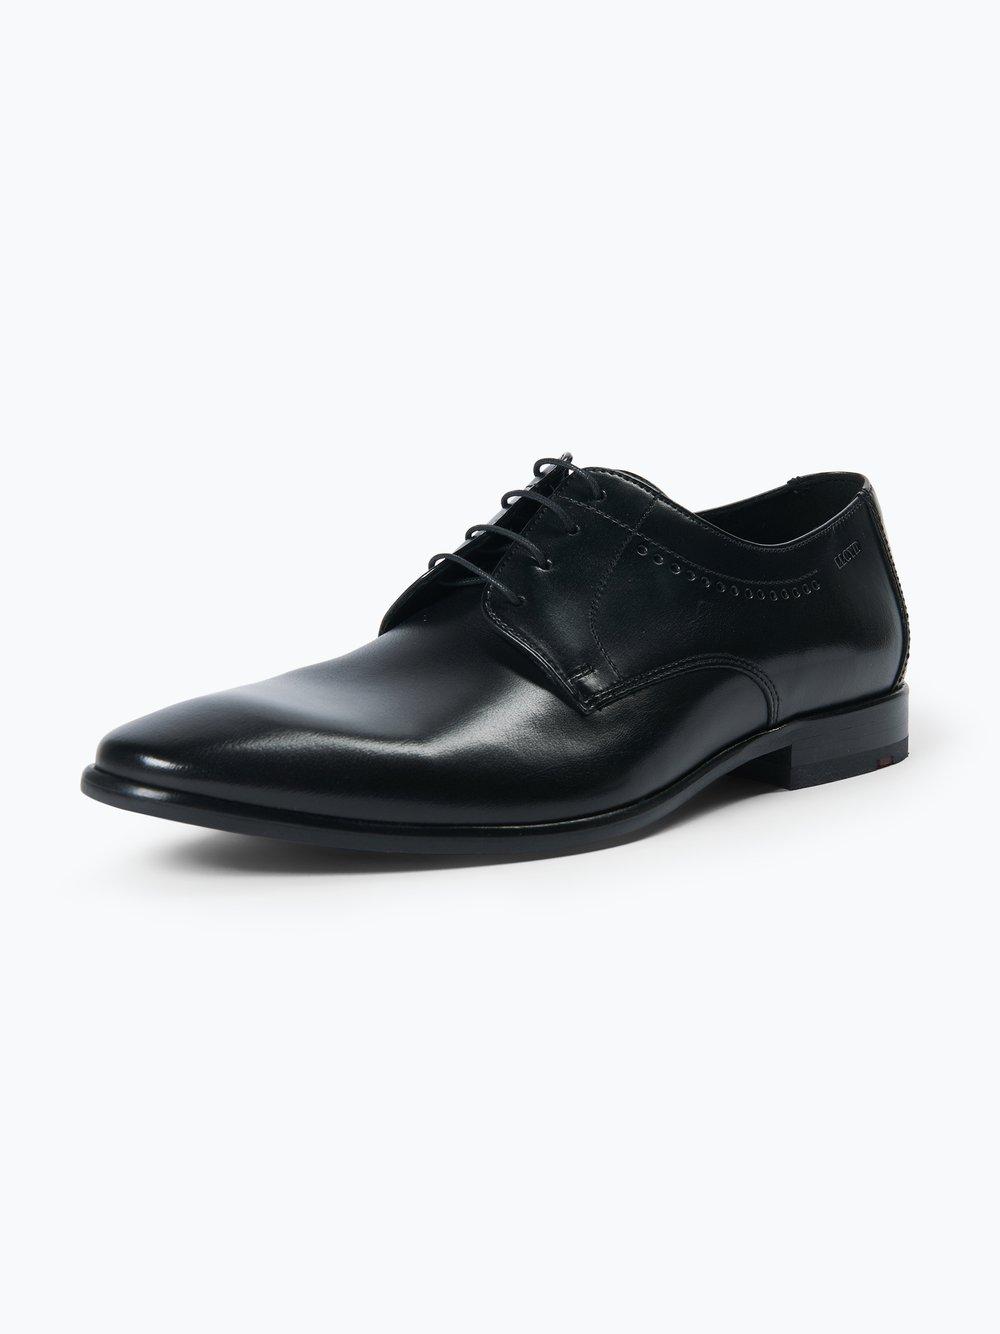 Lloyd – Męskie buty sznurowane ze skóry – Ocas, czarny Van Graaf 381032-0002-00070